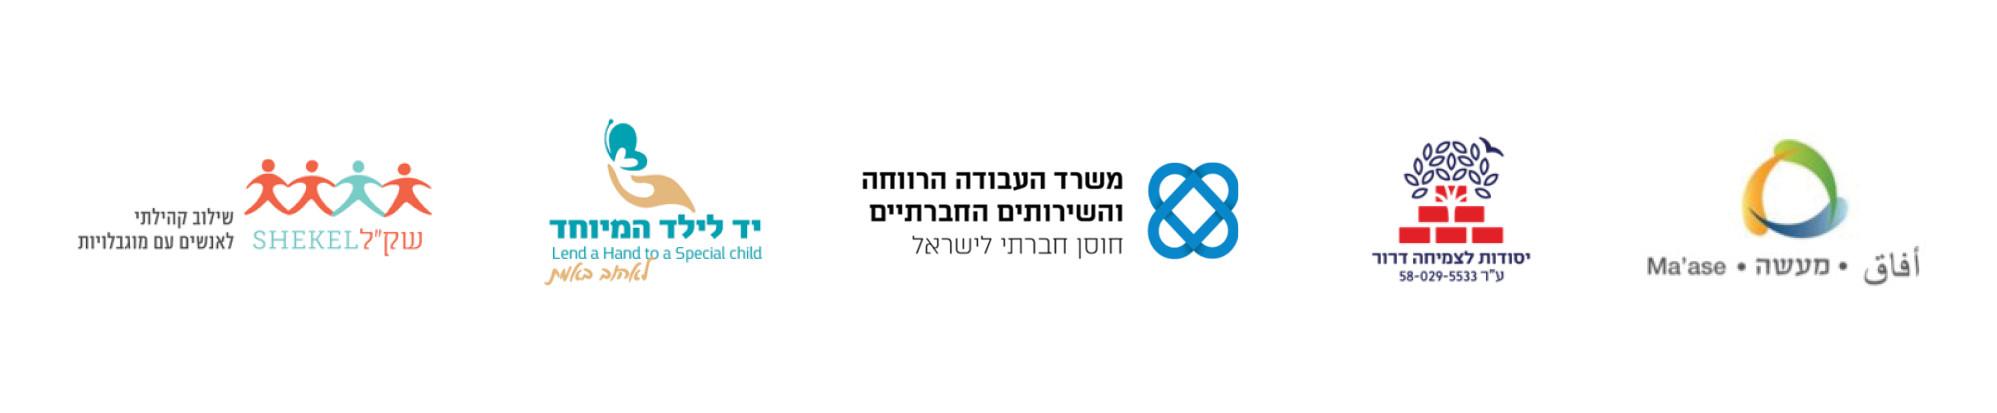 logos_in_line_2021_B16.jpg